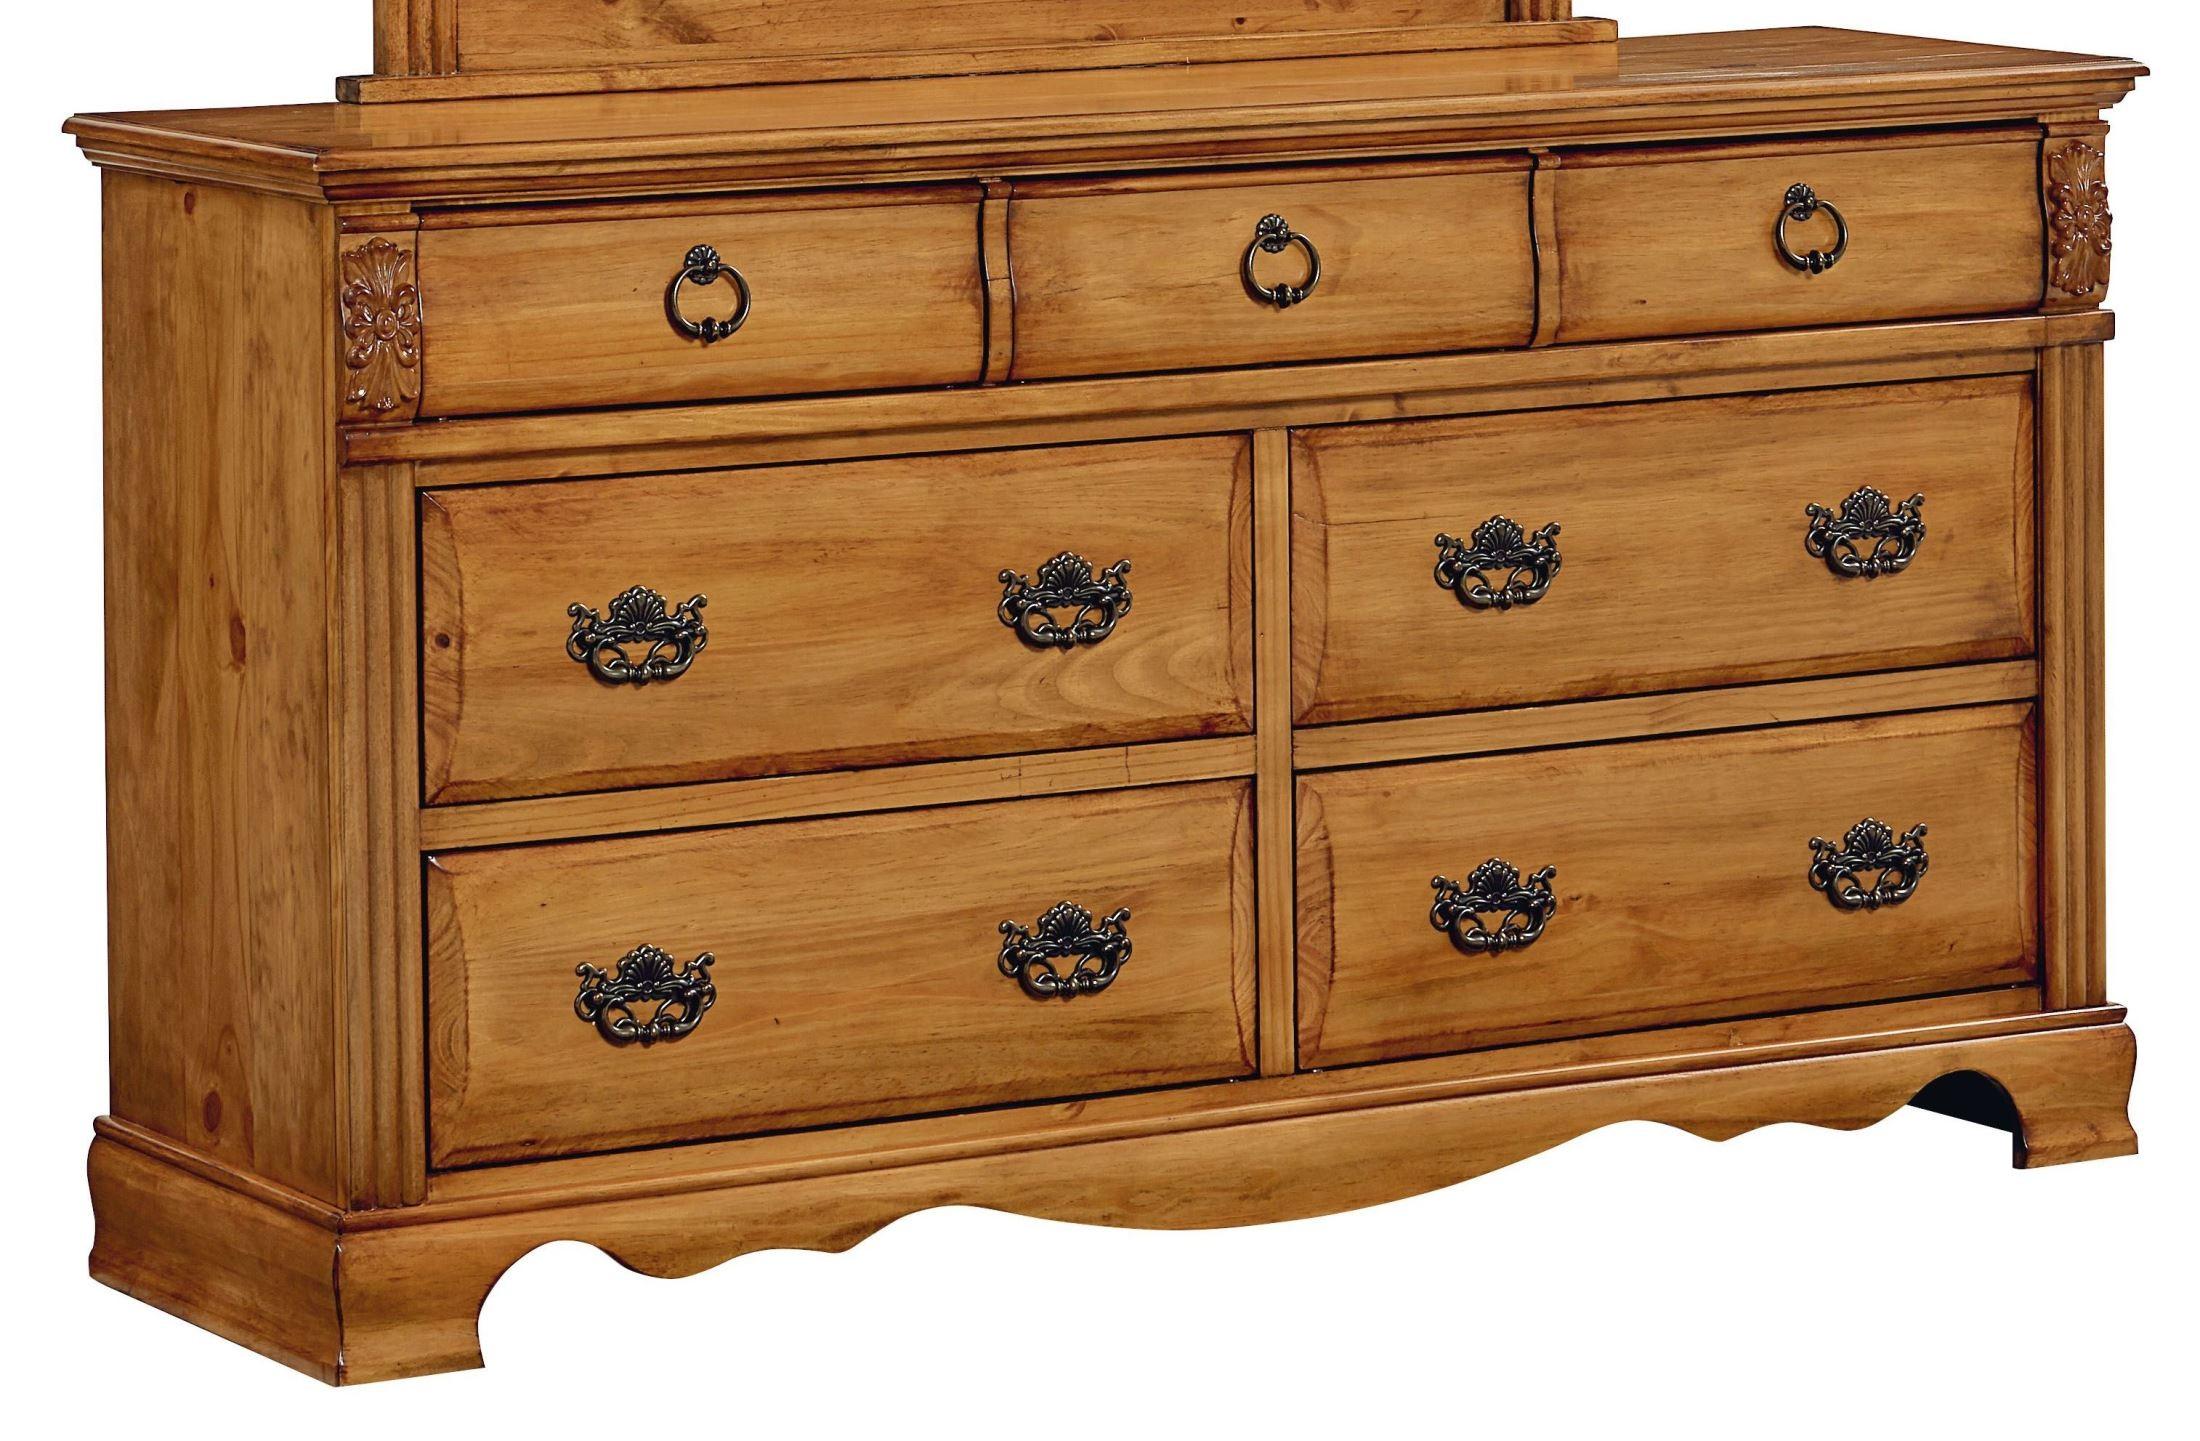 Georgetown Golden Honey Pine Dresser From Standard 83009 Coleman Furniture